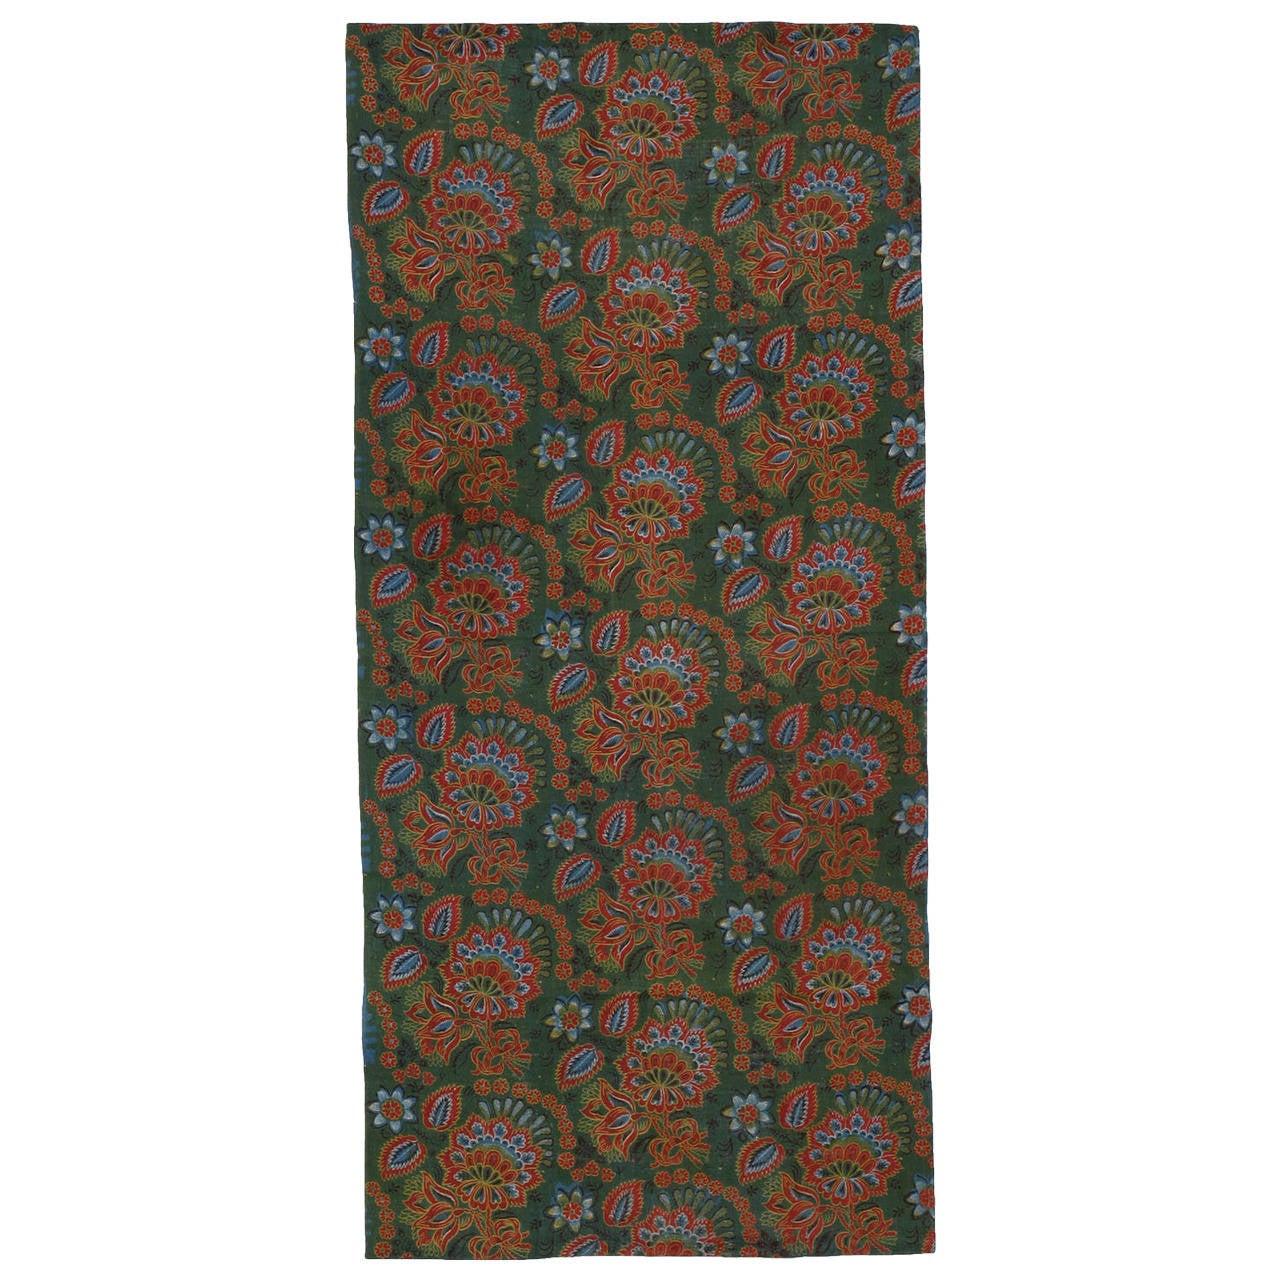 Antique Russian Fabric Panel Rug